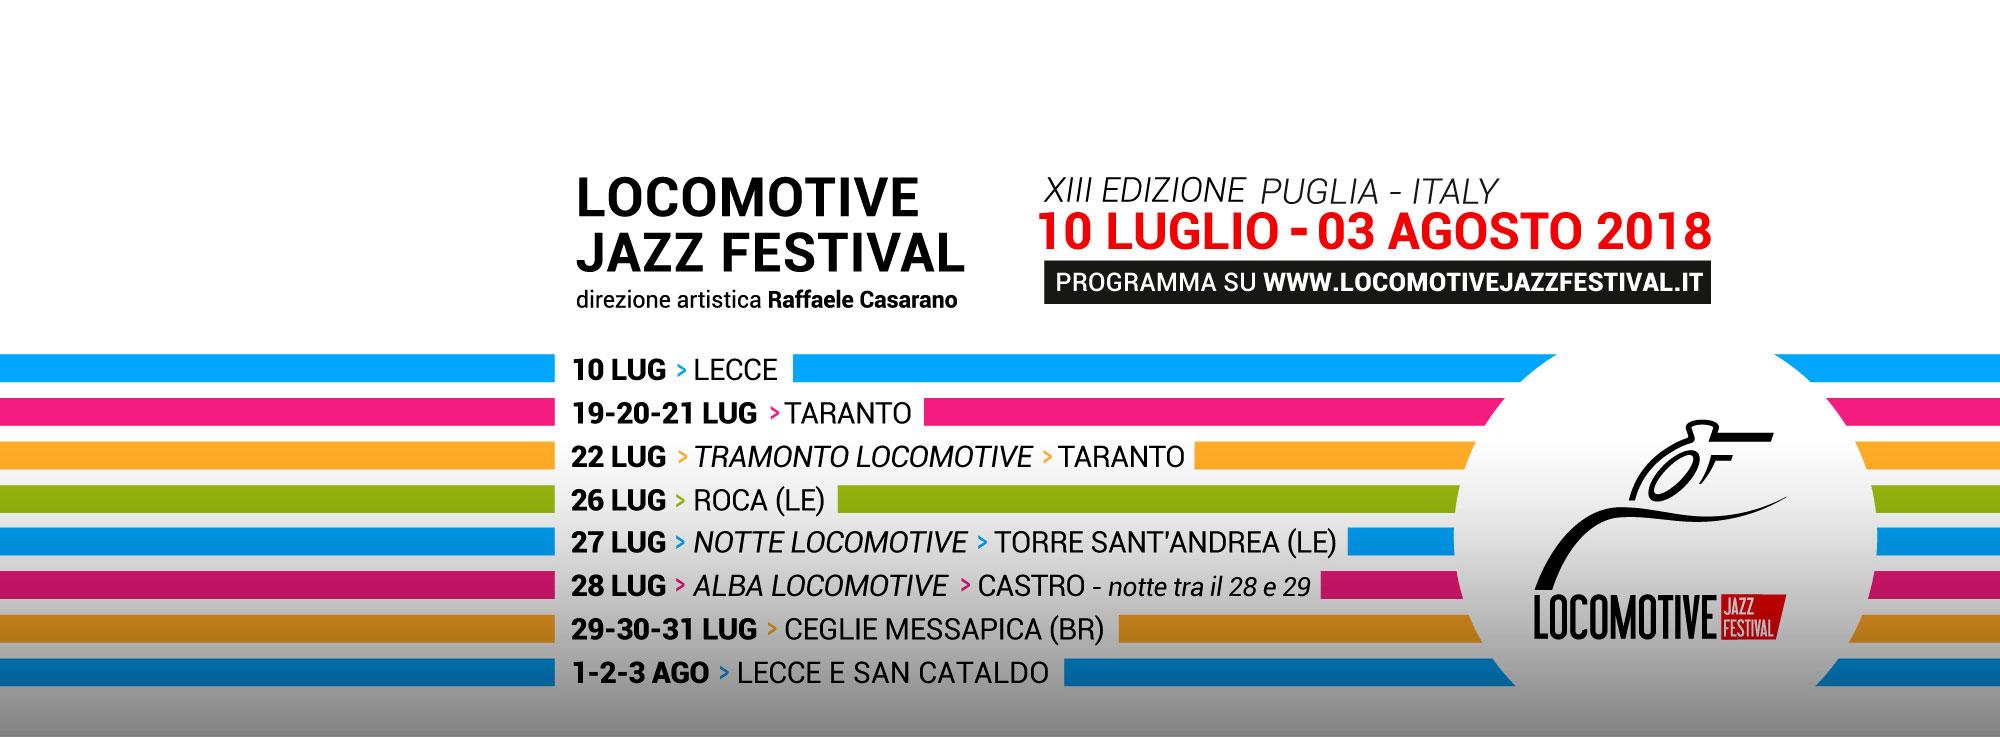 Lecce, Taranto, Ceglie Messapica, Castro: Locomotive Jazz Festival